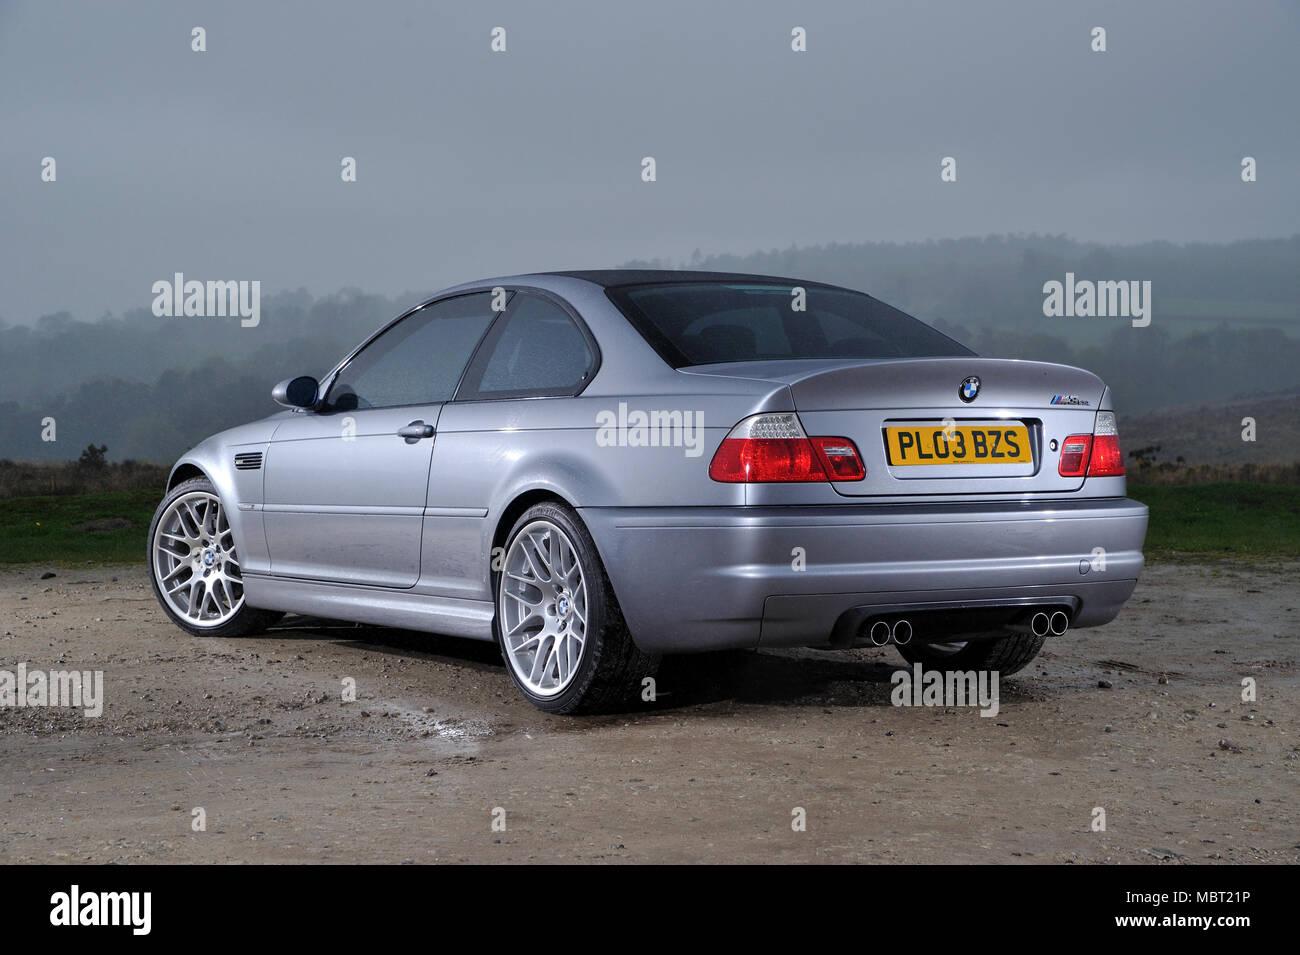 2003 Bmw M3 Csl E92 Shape German Sports Coupe Stock Photo 179393362